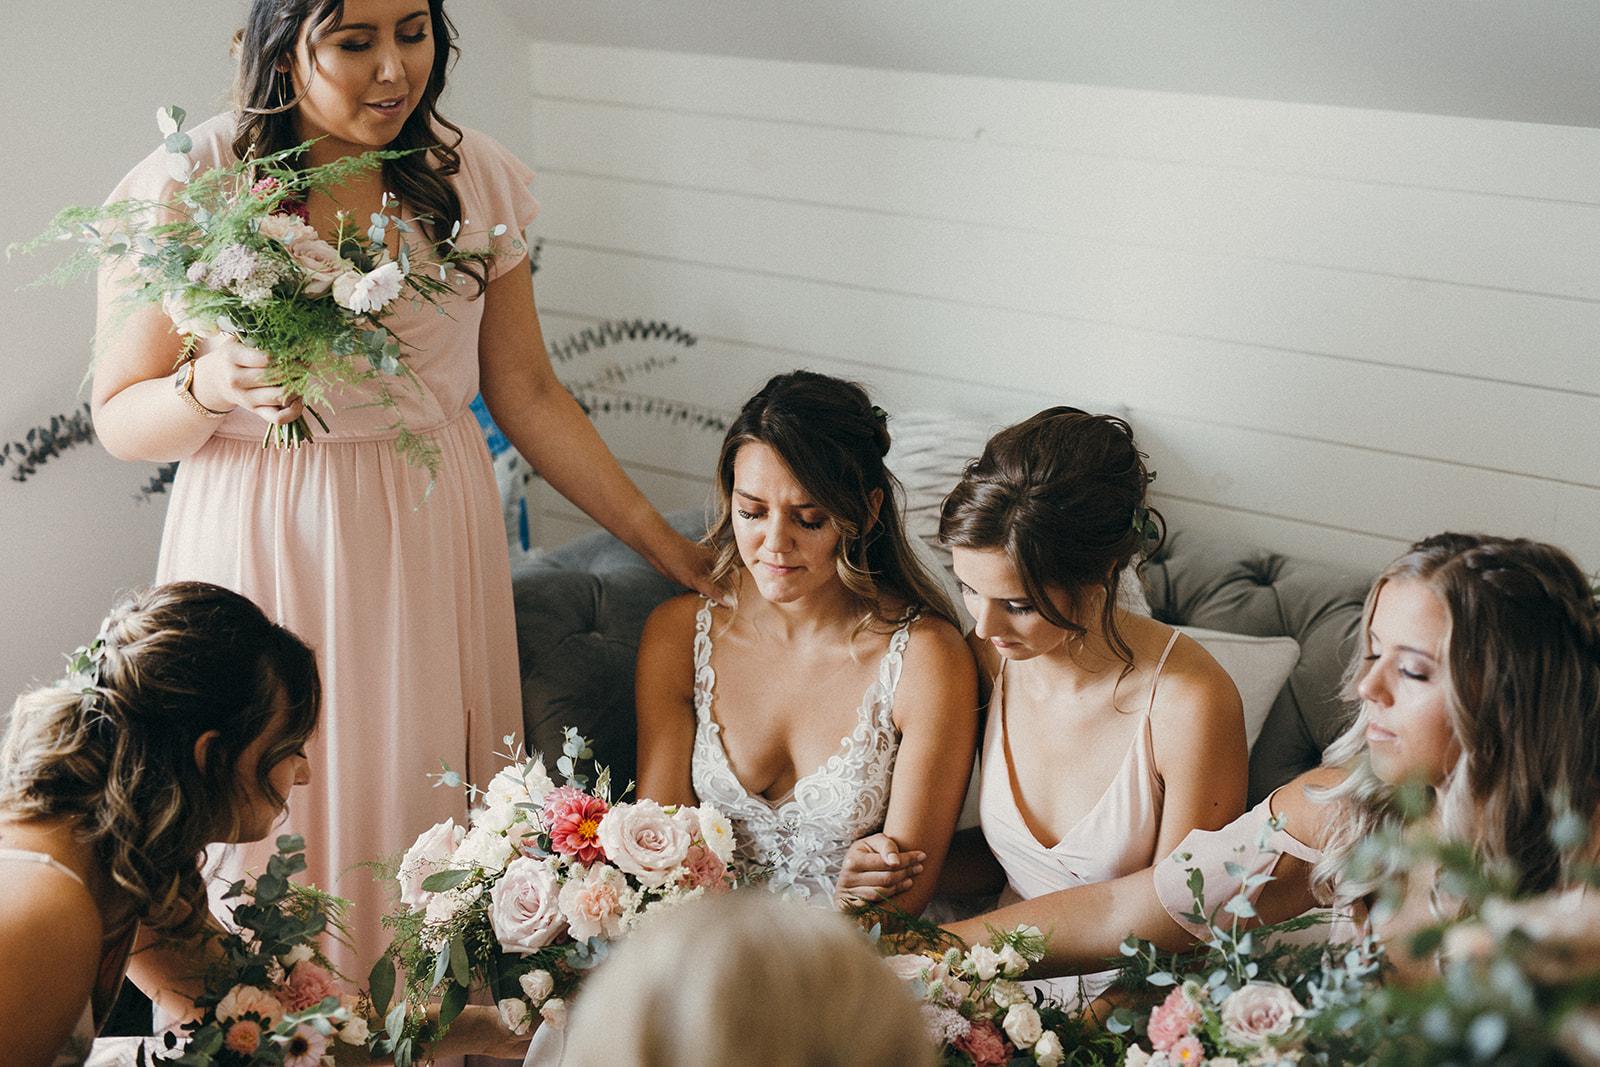 kaden_justine_wedding_1033.jpg